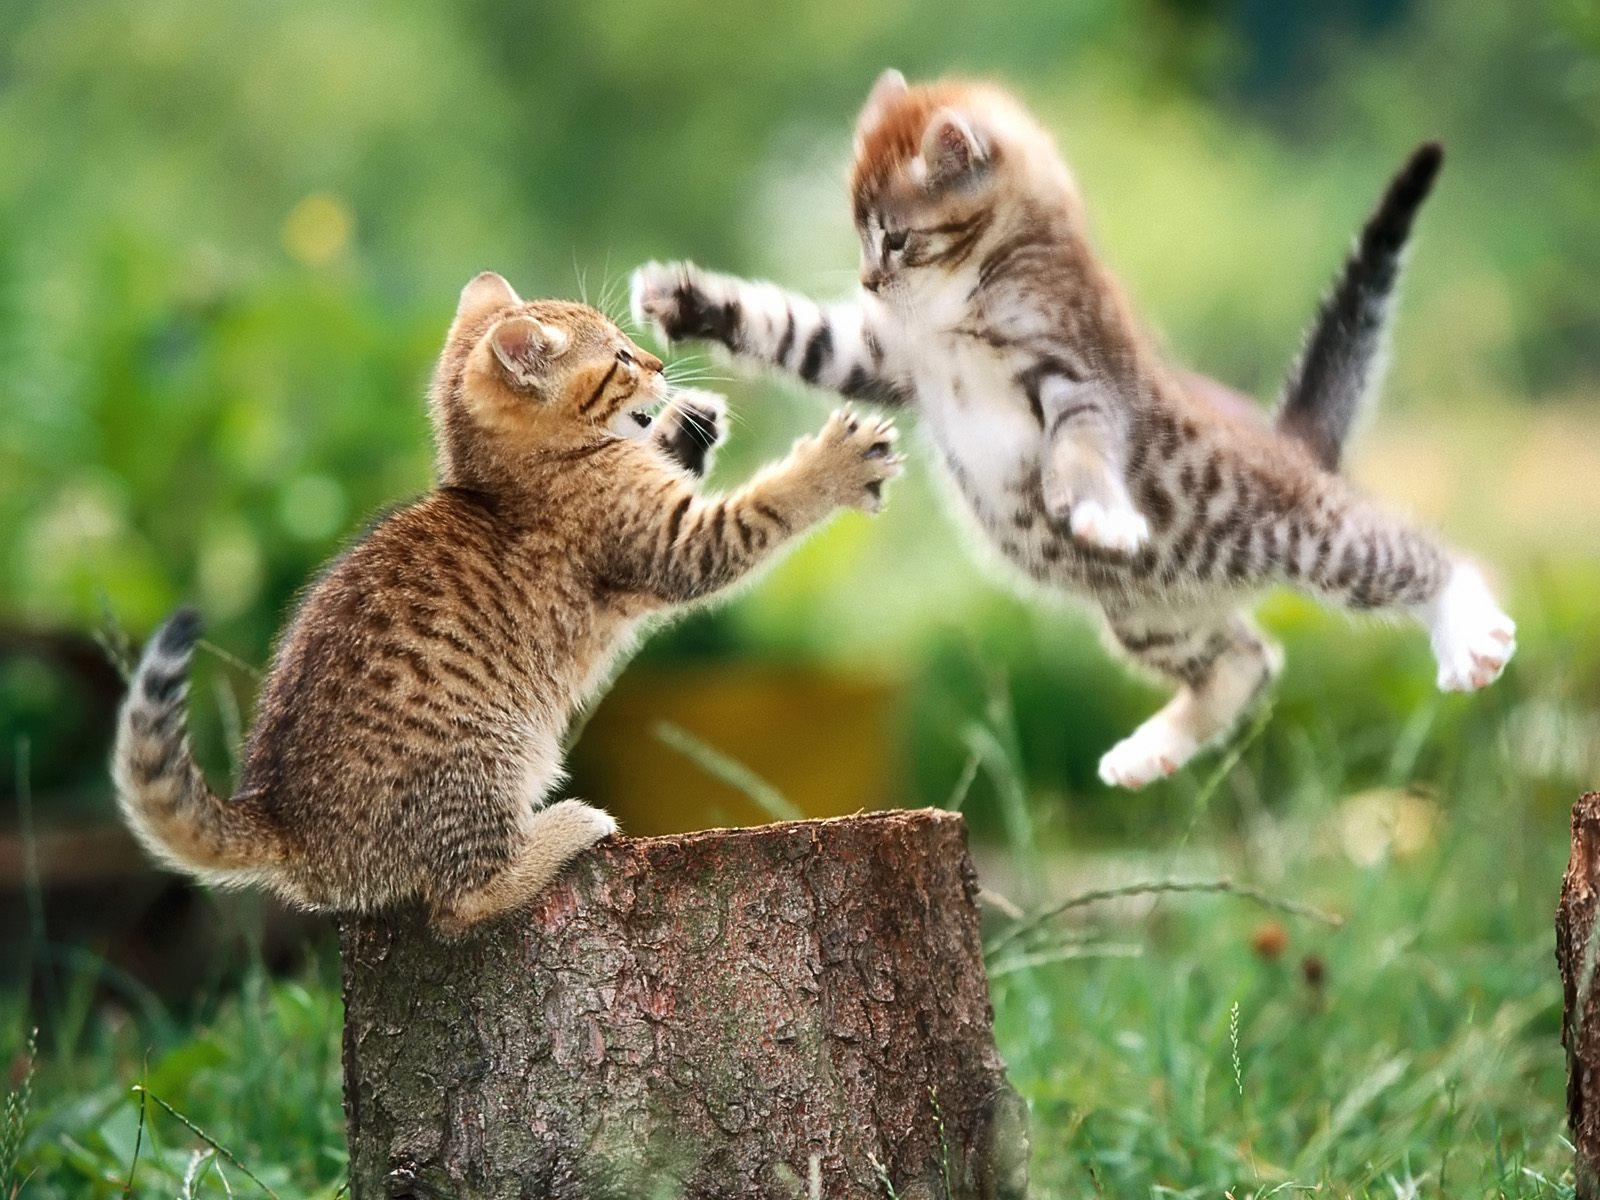 HD Wallpaper | Background ID:5726. 1600x1200 Animal Cat